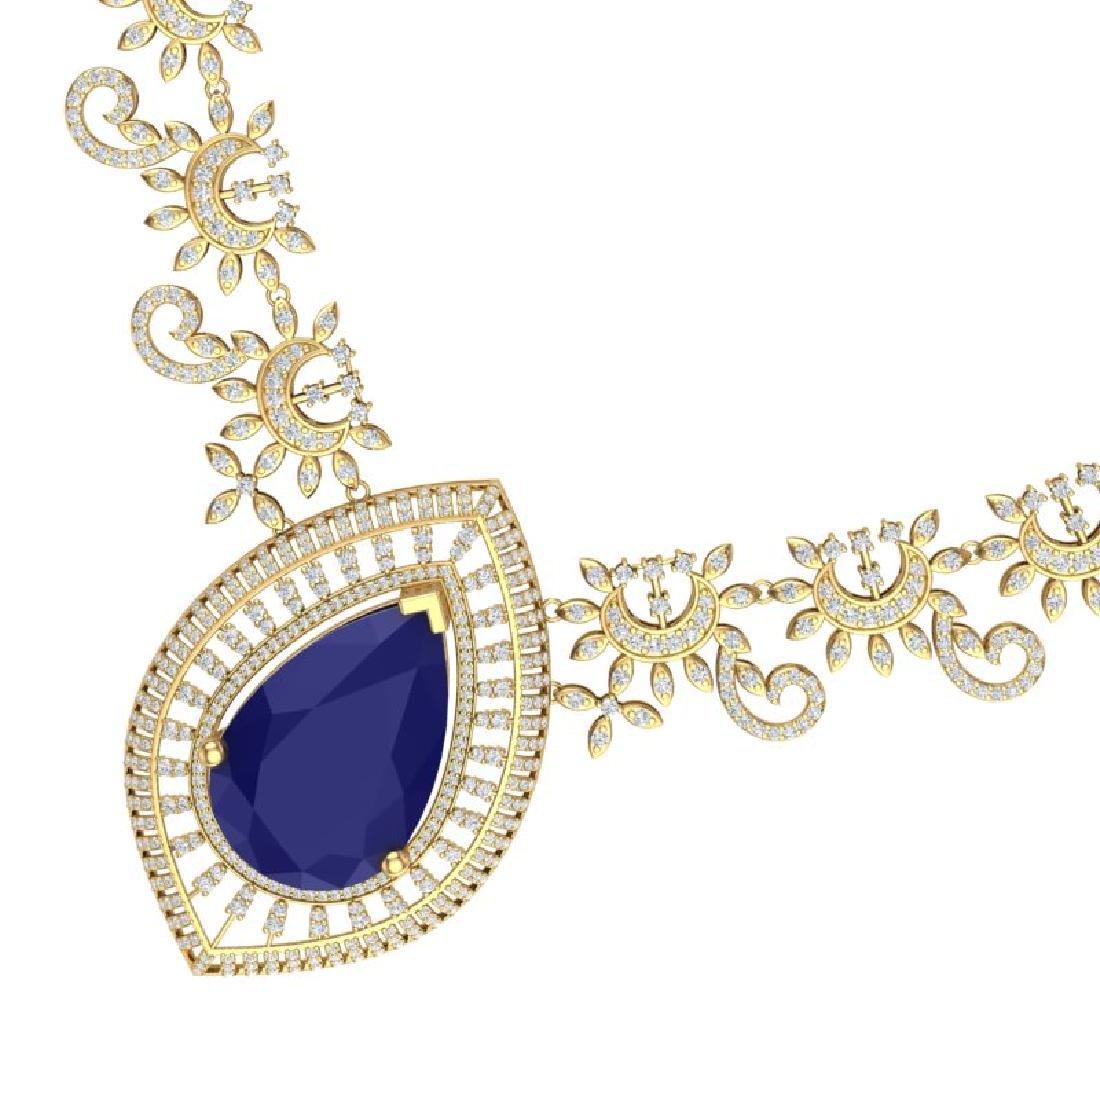 65.75 CTW Royalty Sapphire & VS Diamond Necklace 18K